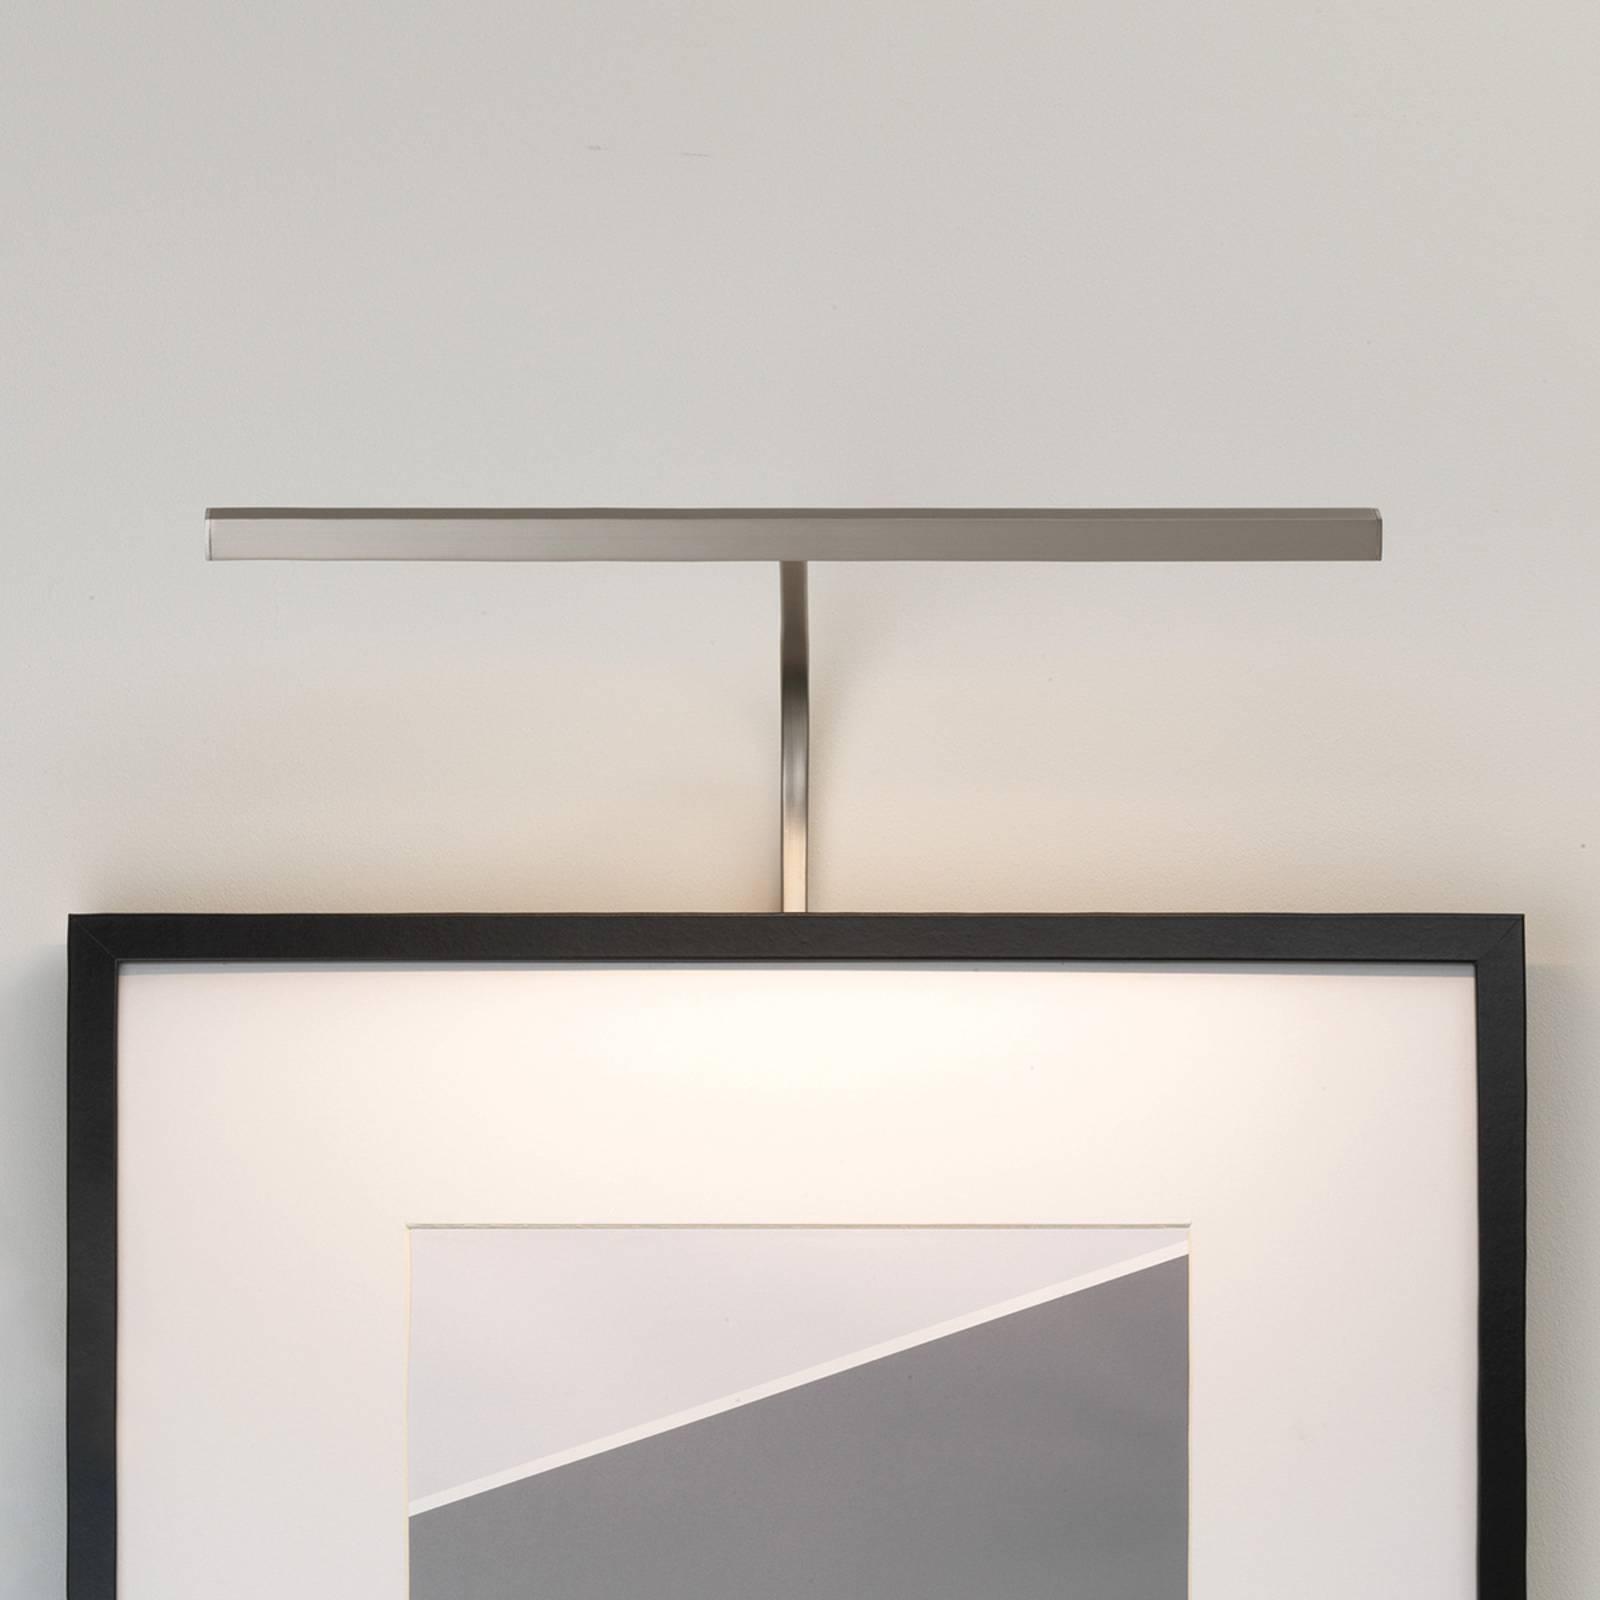 Astro Mondrian Frame Mounted applique nickel 40cm